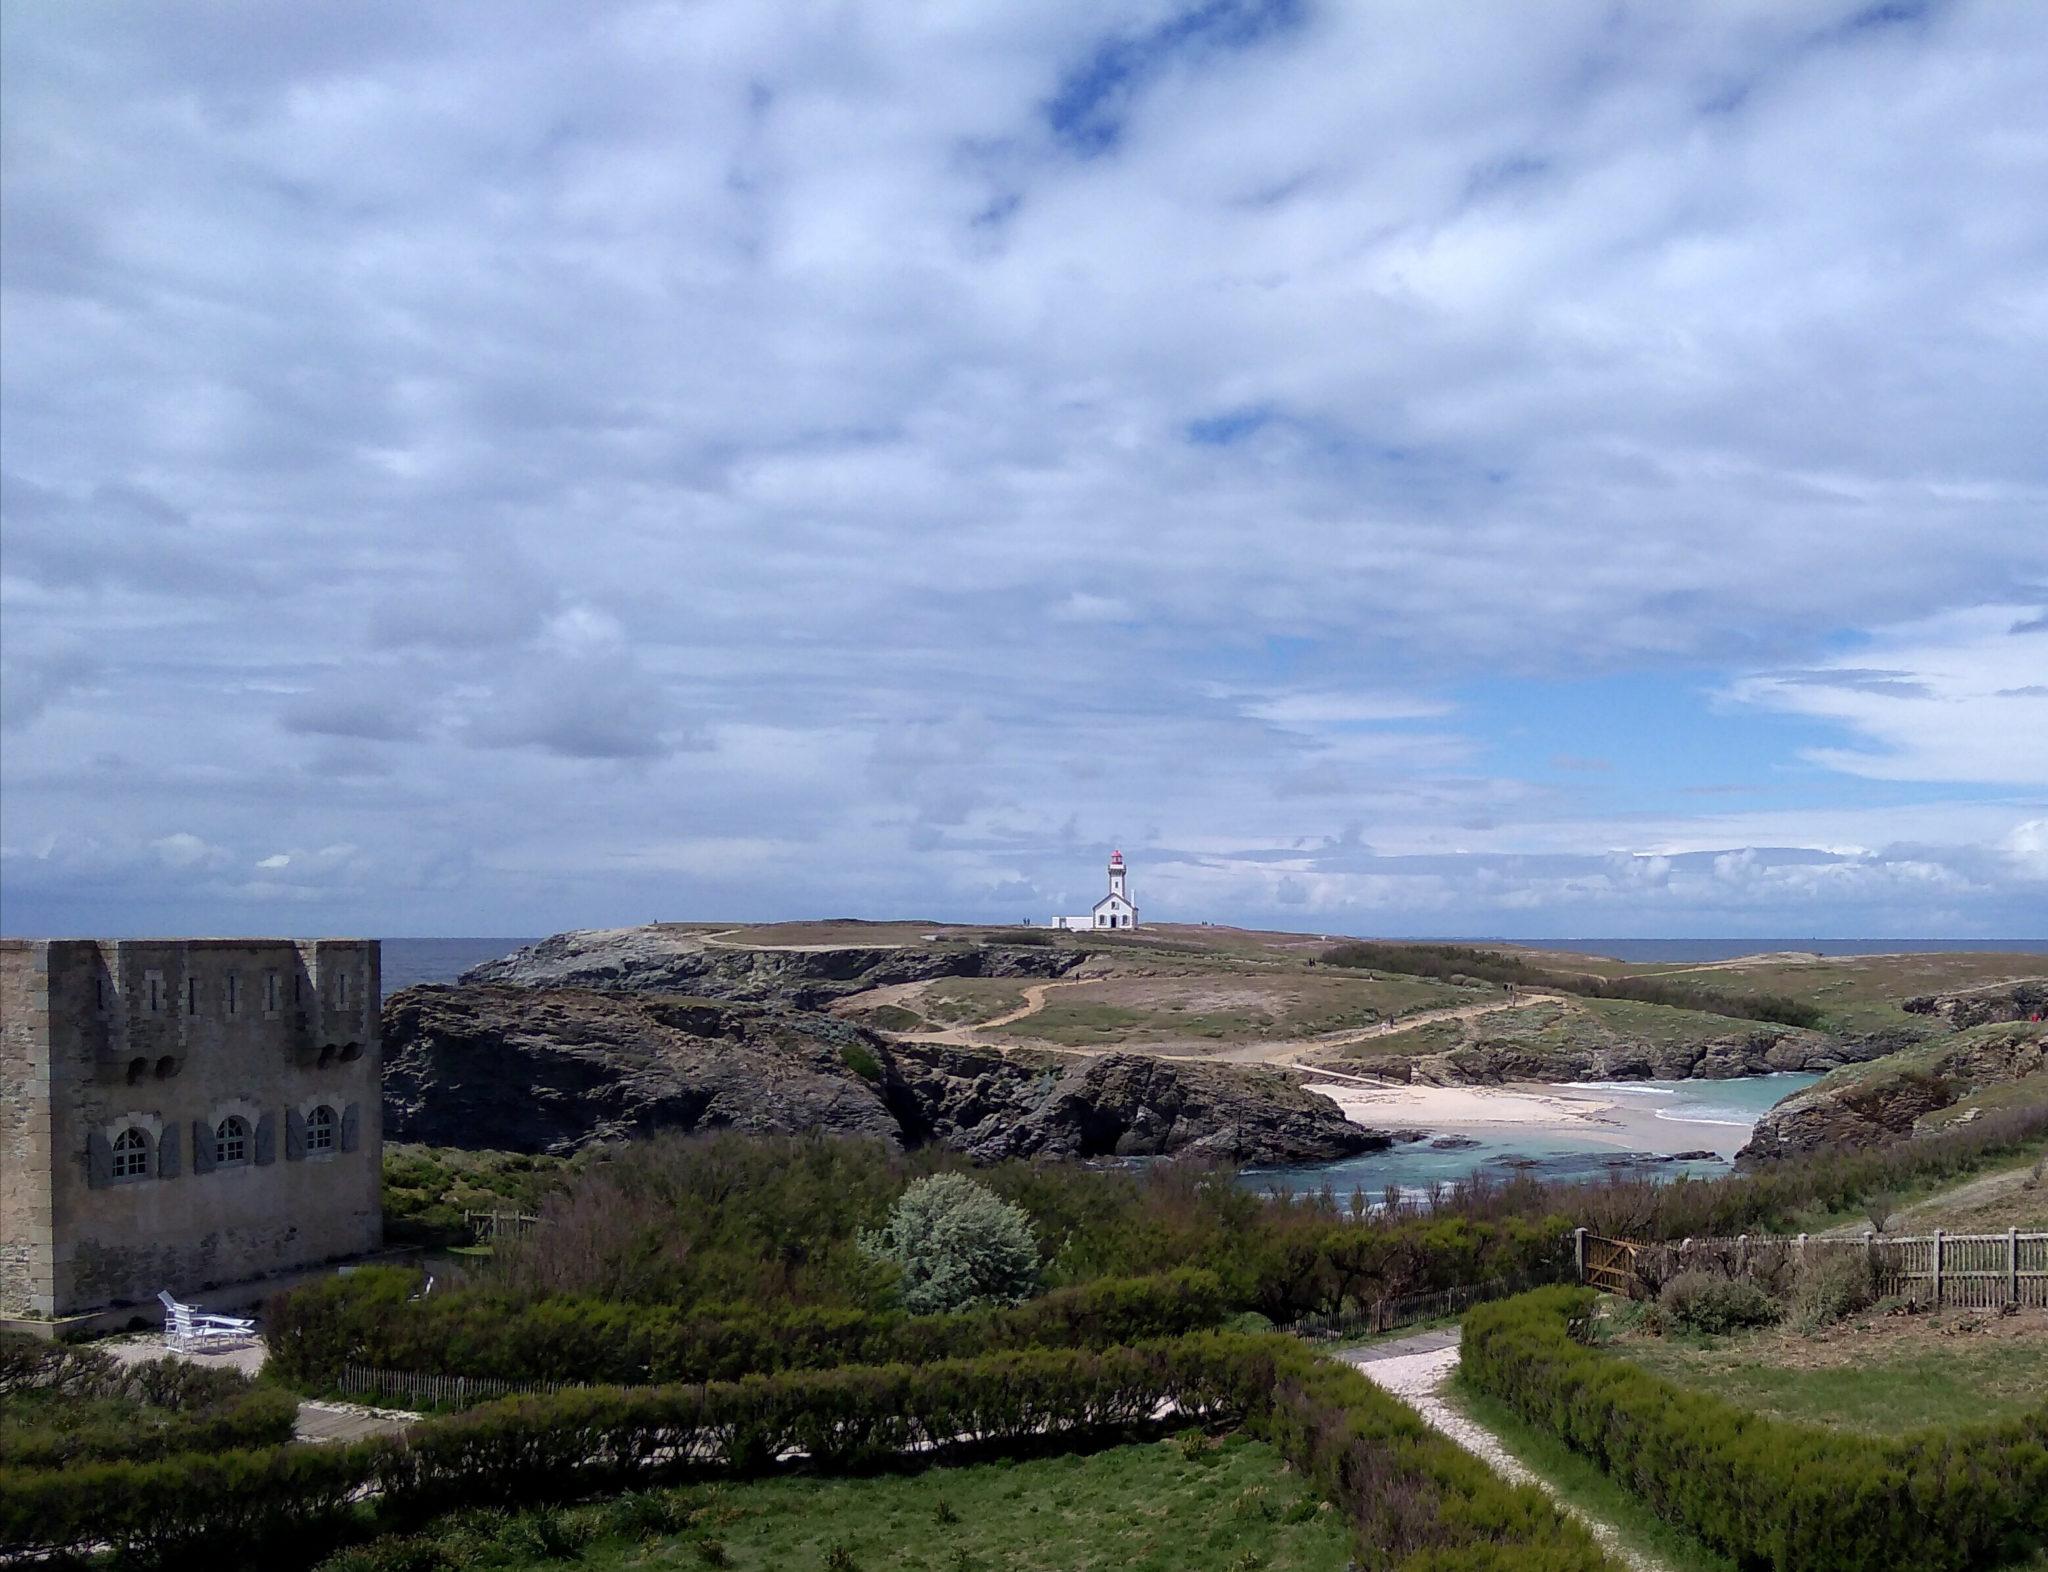 Sarah Bernhardt fortin Pointe des Poulains Belle-île-en-Mer Bretagne week-end amoureux